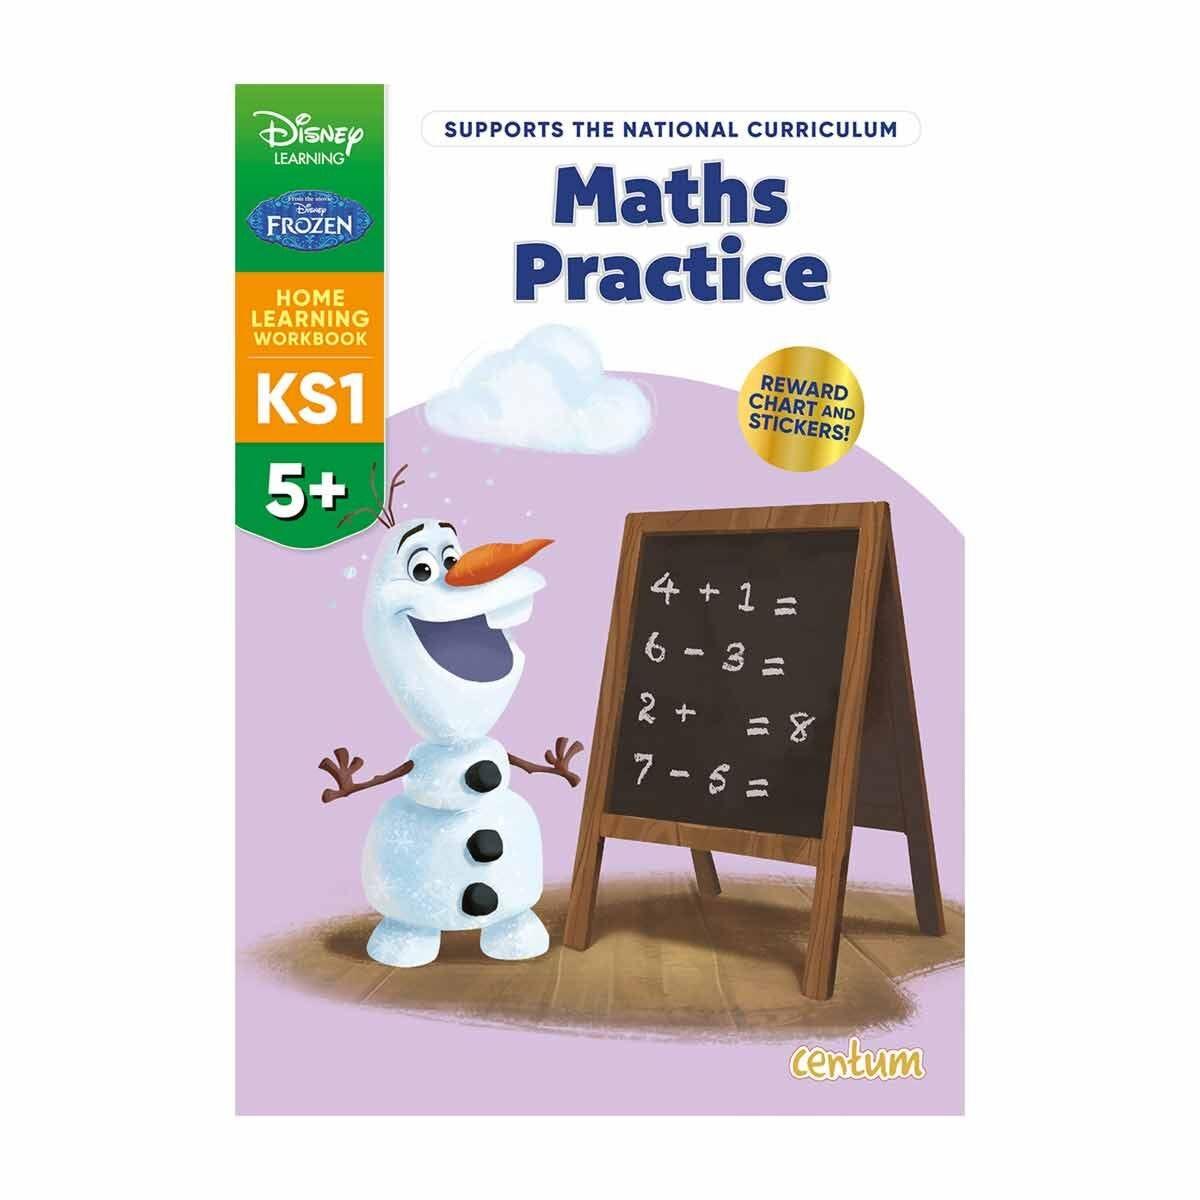 Centum Disney Learning Frozen Maths Practice 5